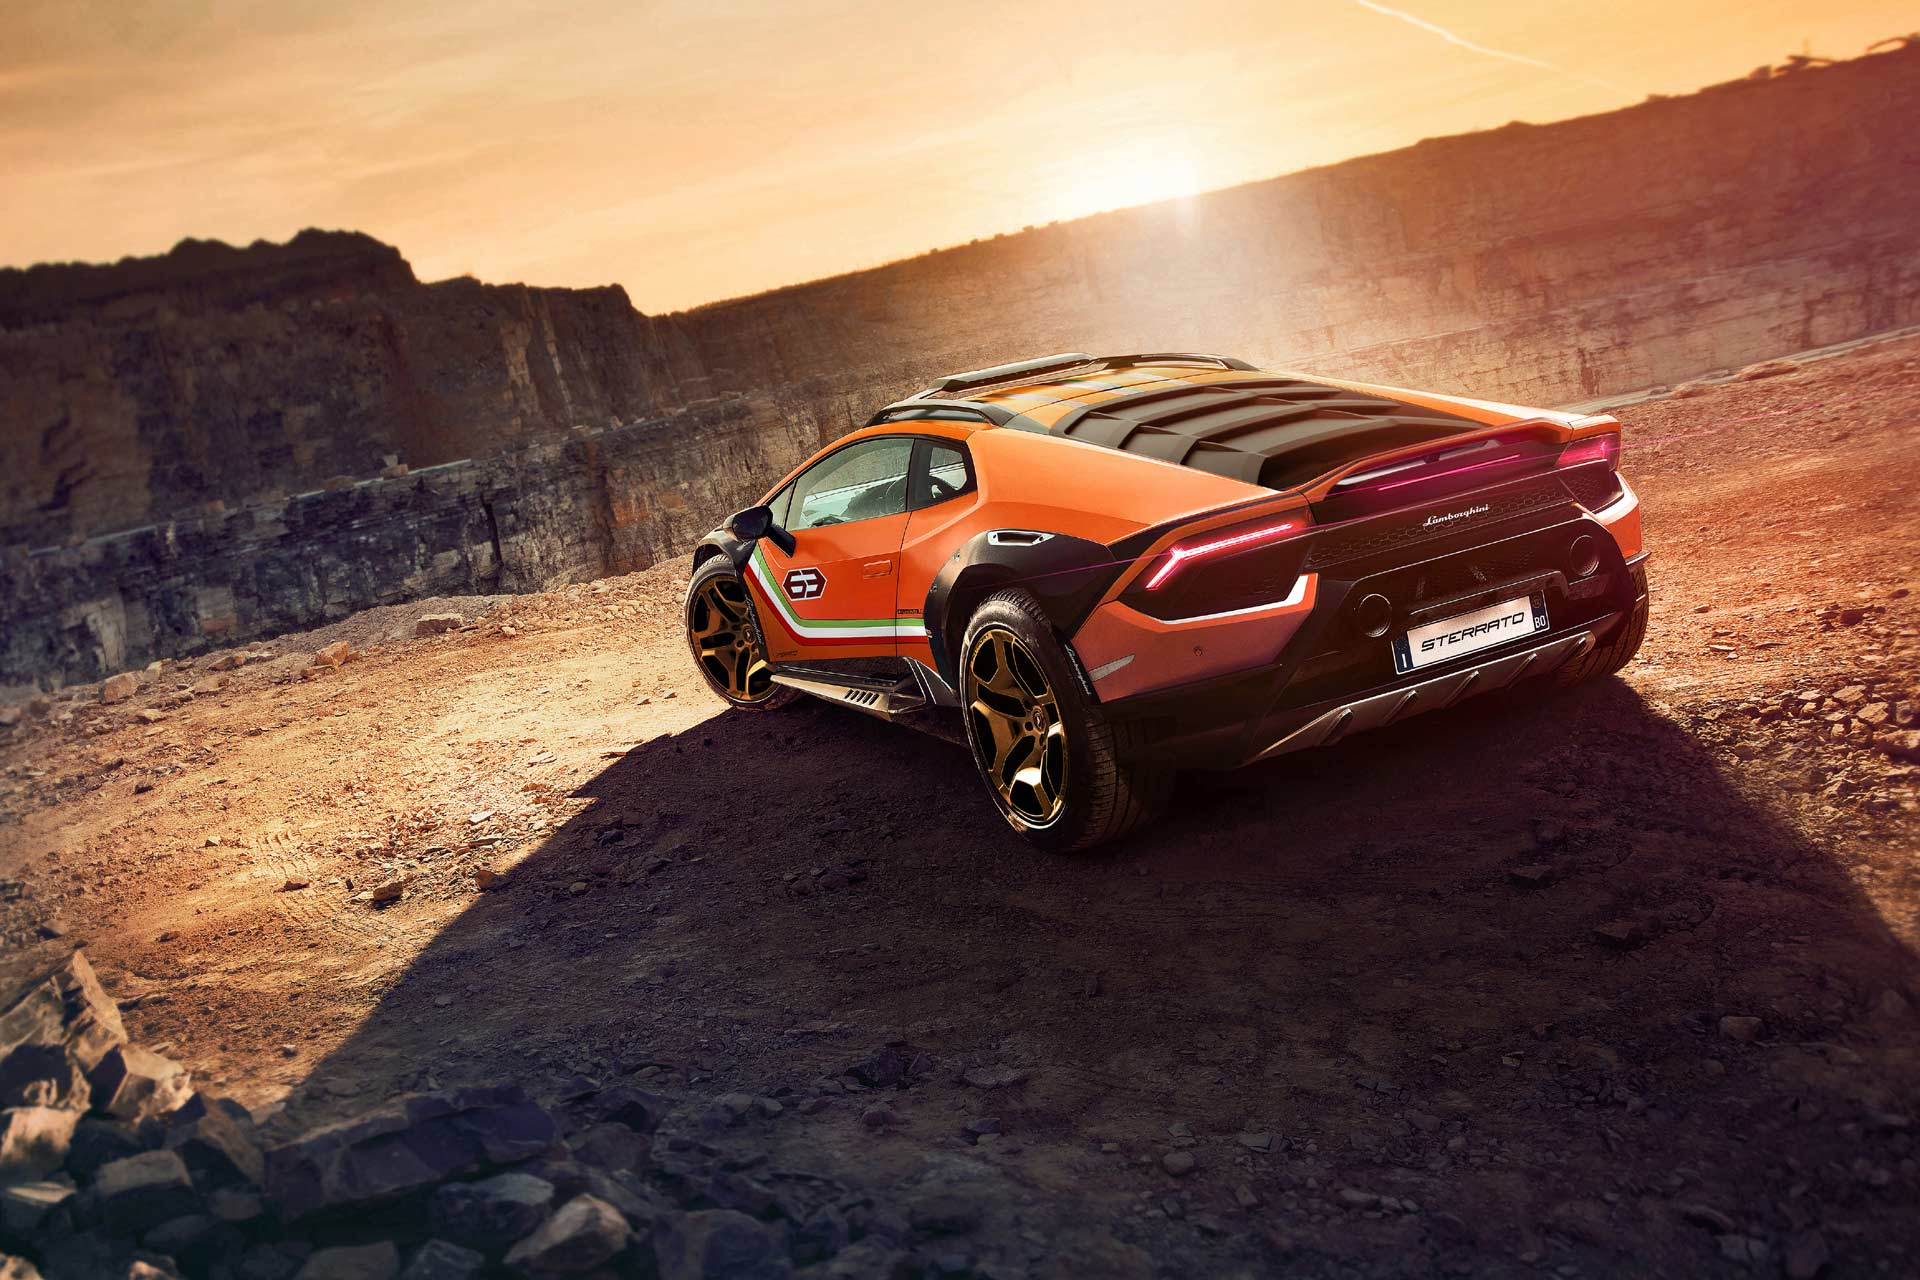 Automobili Lamborghini erobert Neuland mit dem Huracán Sterrato Concept